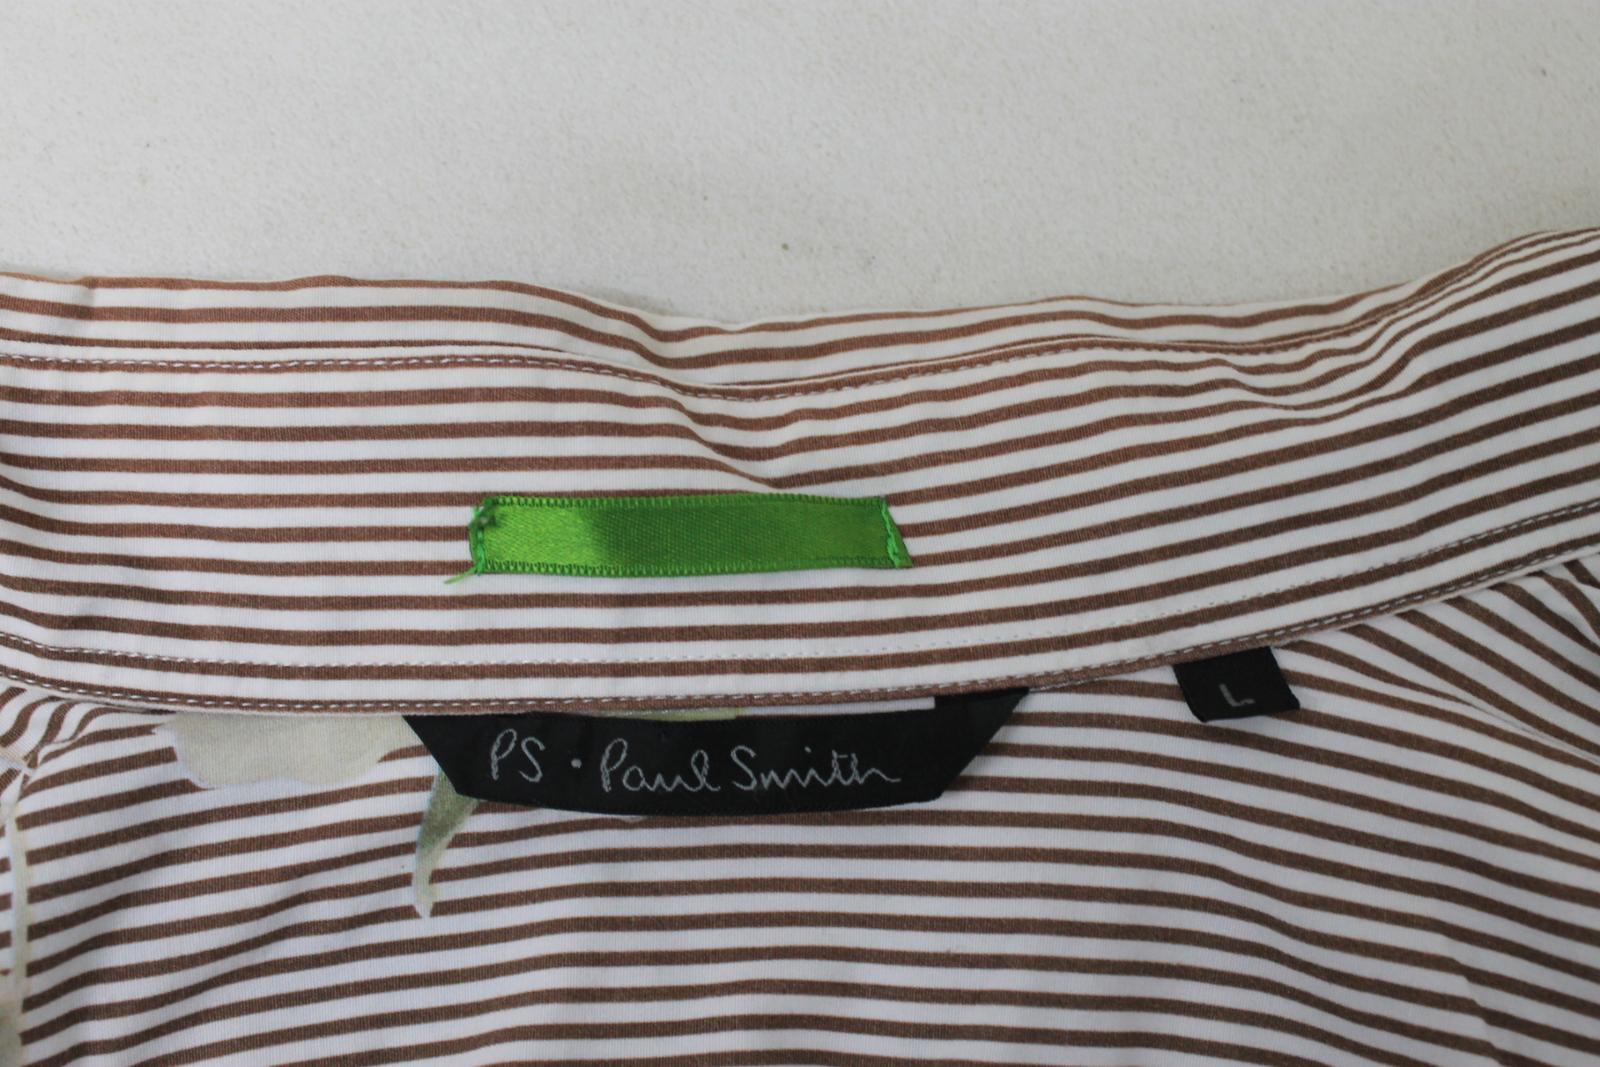 Paul-Smith-Para-Hombre-Marron-Verde-A-Rayas-Manga-Larga-de-impresion-de-hojas-Algodon-Camisa-Tamano miniatura 8